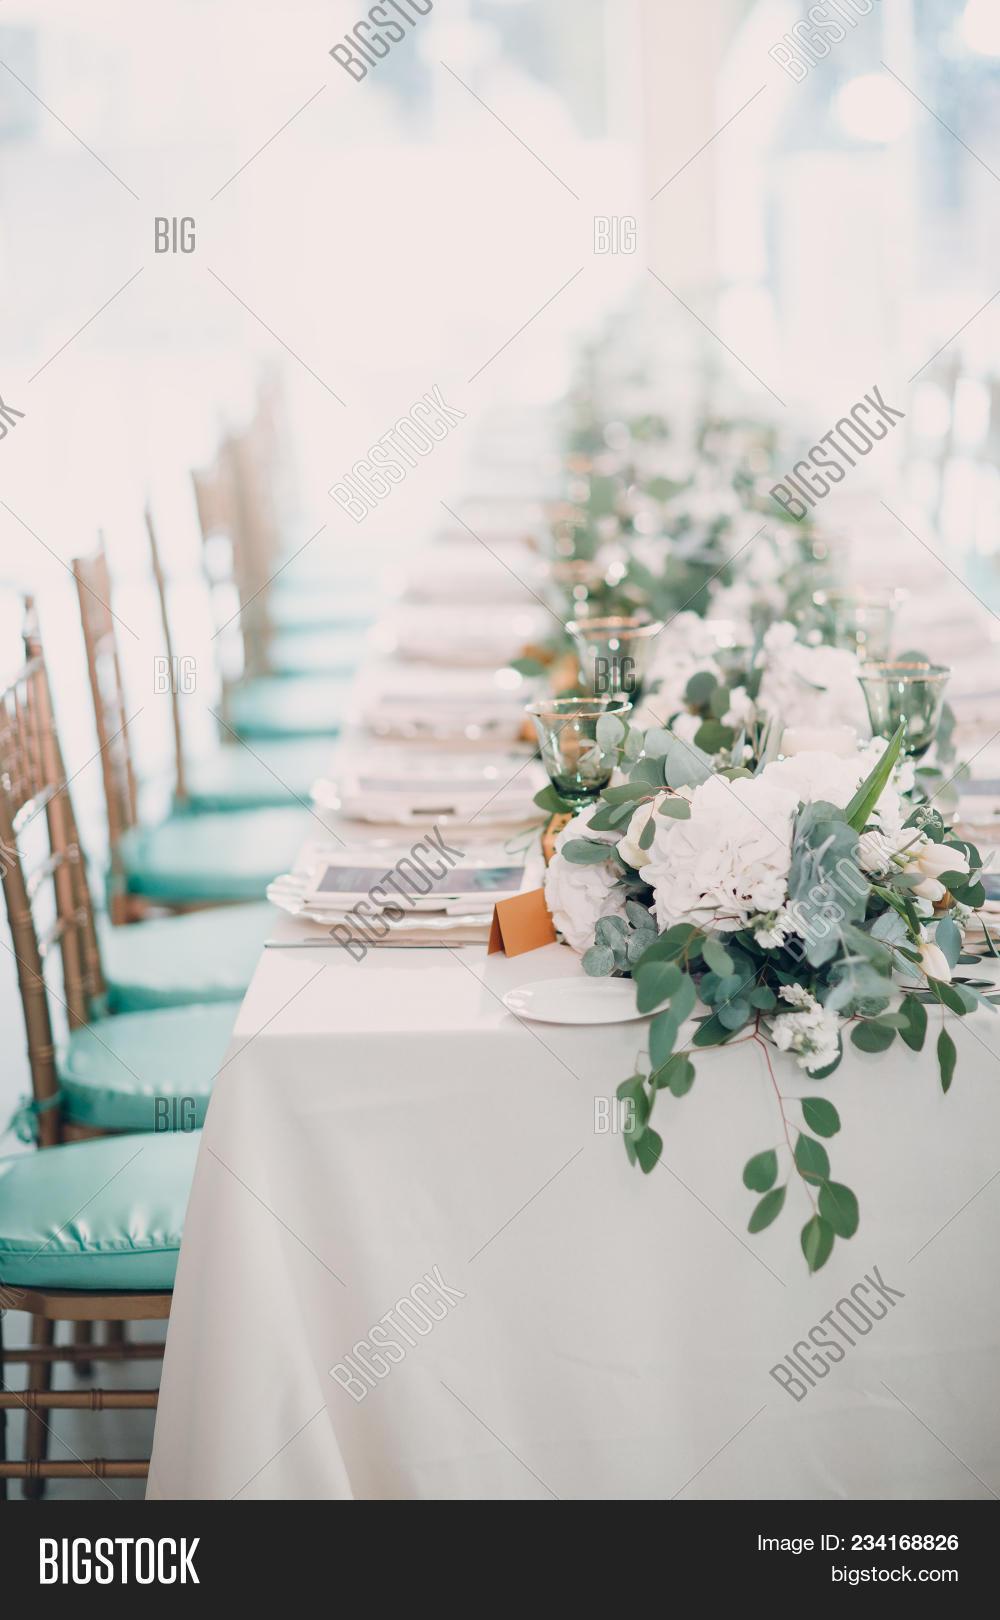 Wedding Decor White Image & Photo (Free Trial) | Bigstock